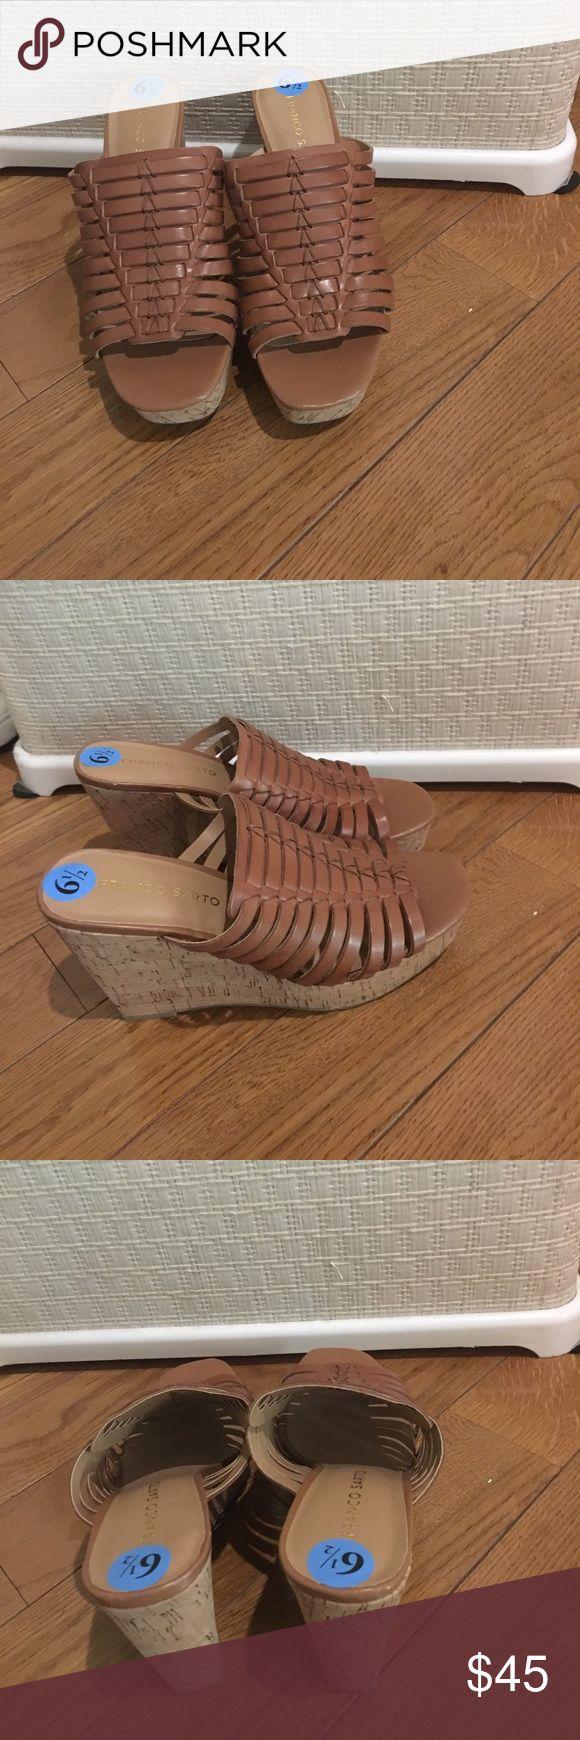 NWOT franco sarto brown wedges NWOT franco sarto brown wedges Franco Sarto Shoes Wedges